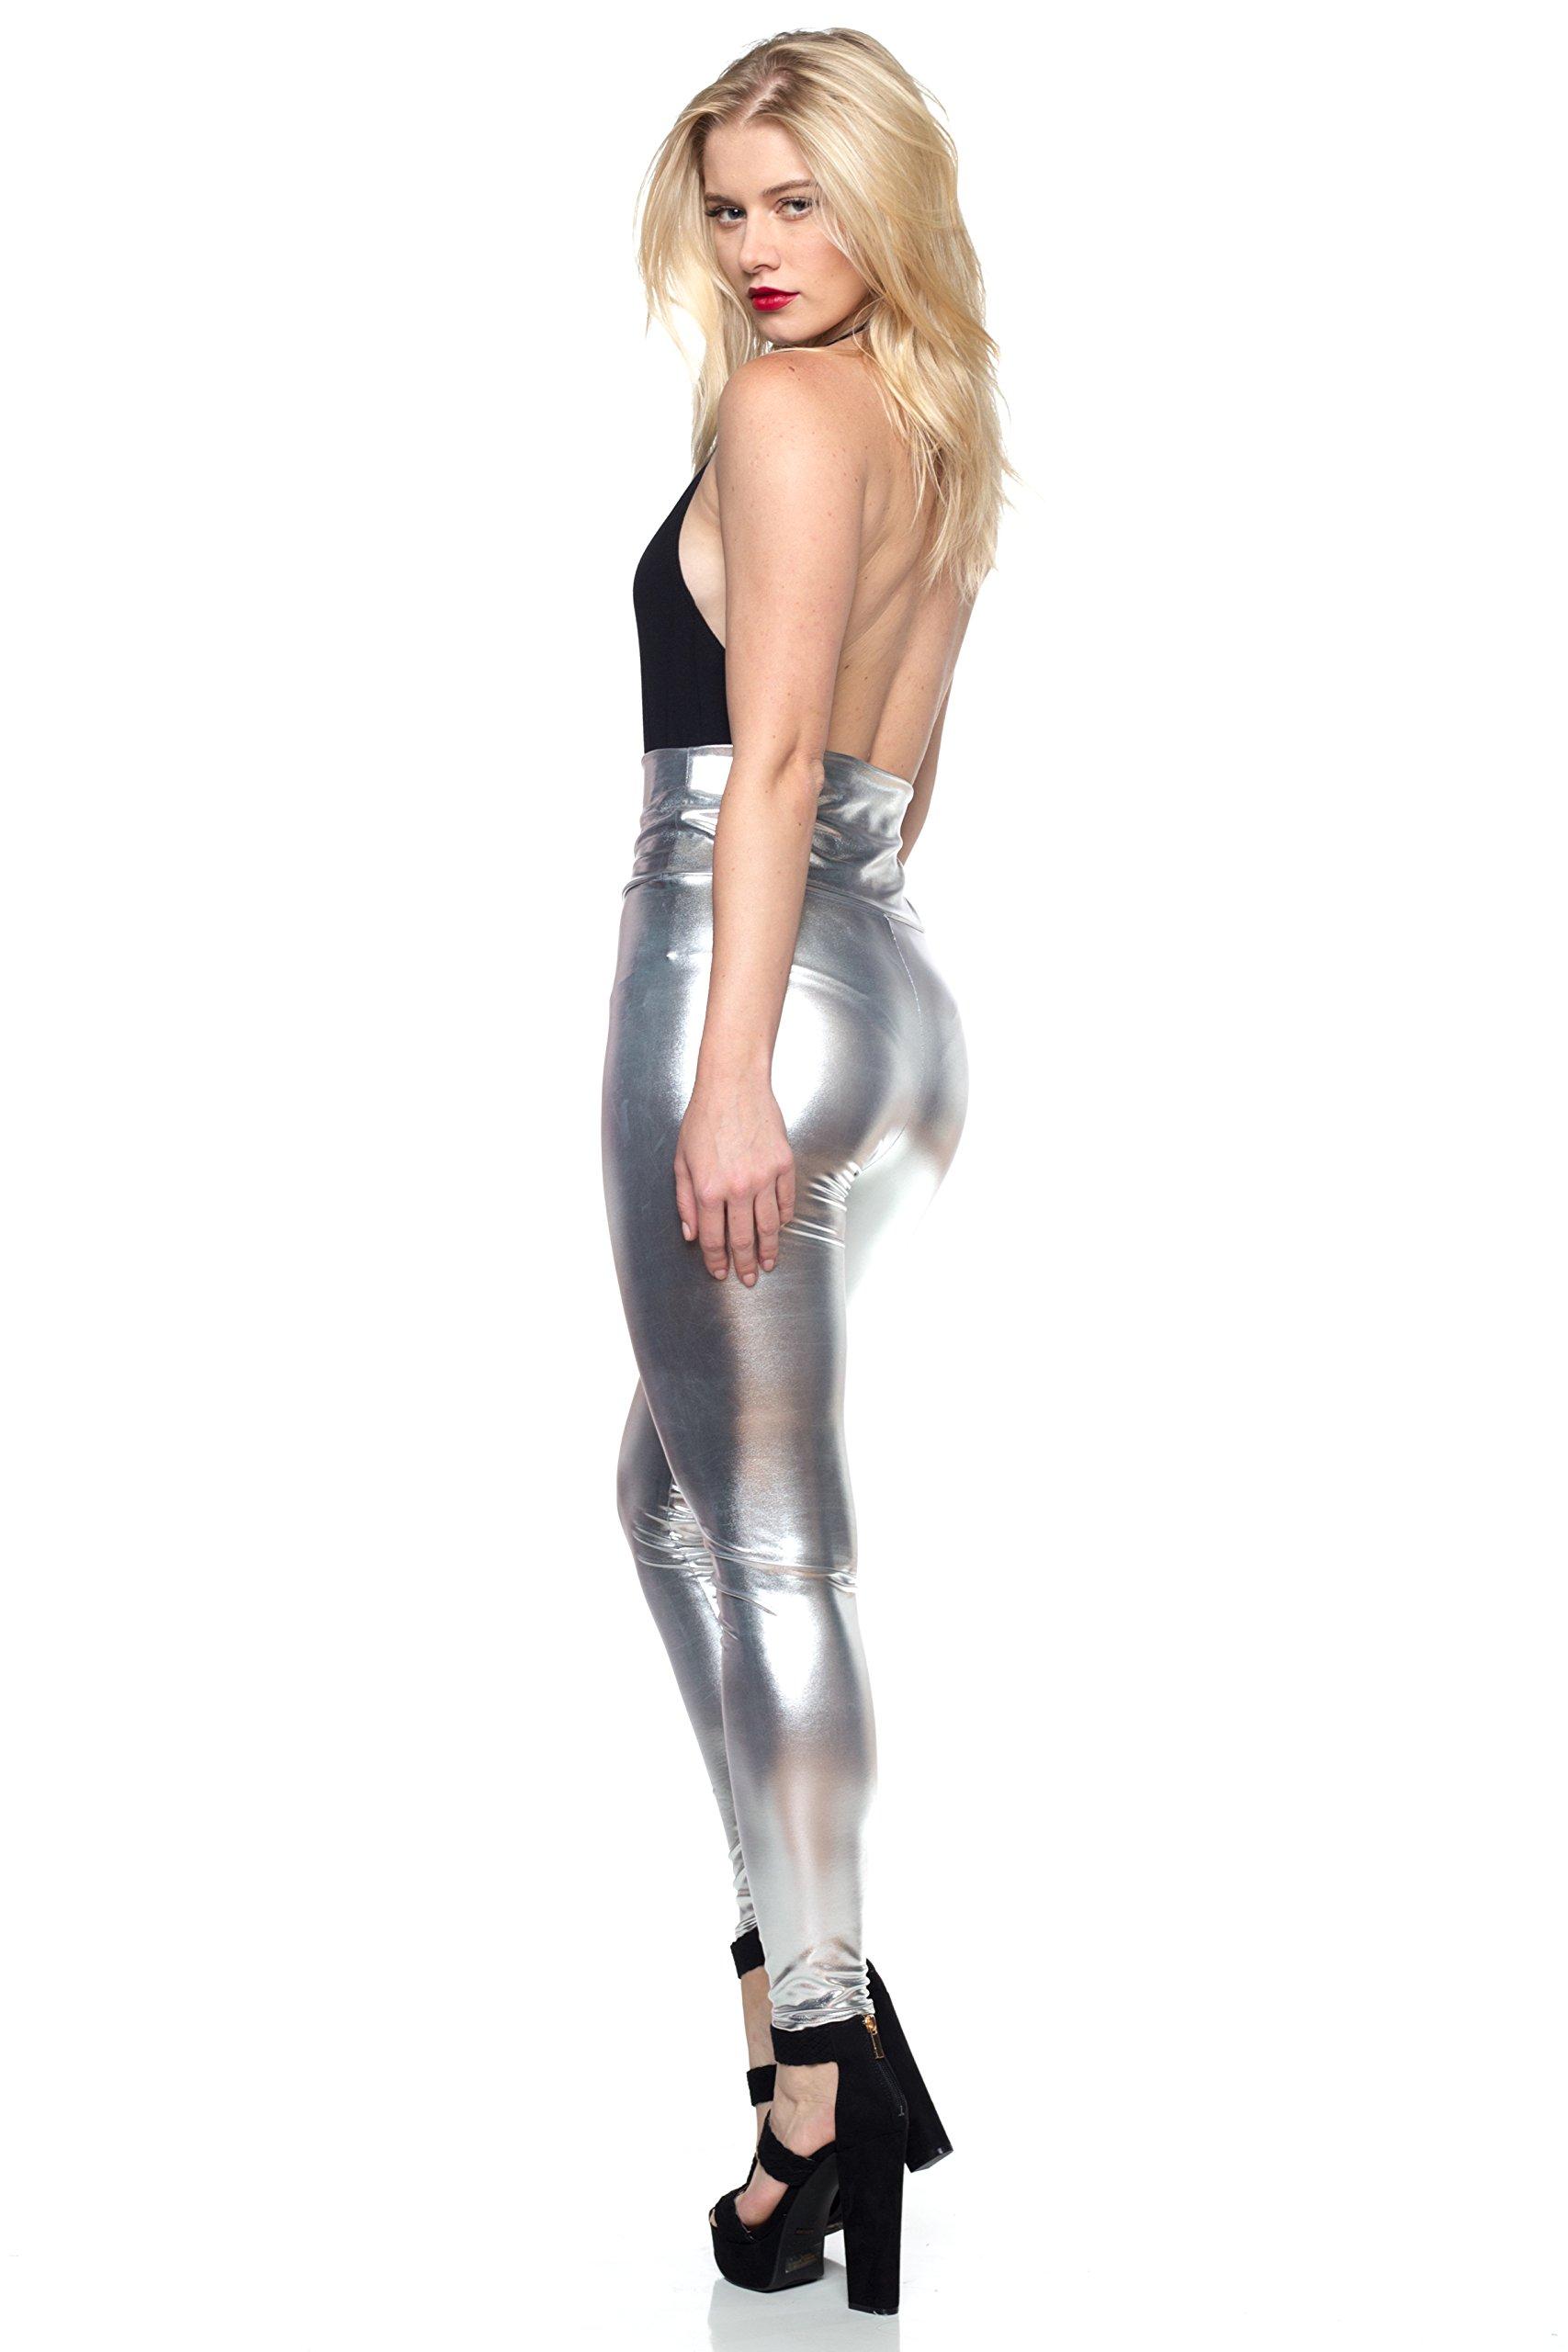 J2 Love Women's Junior Plus Faux Leather High Waist Leggings, 5X, Silver by Cemi Ceri (Image #4)